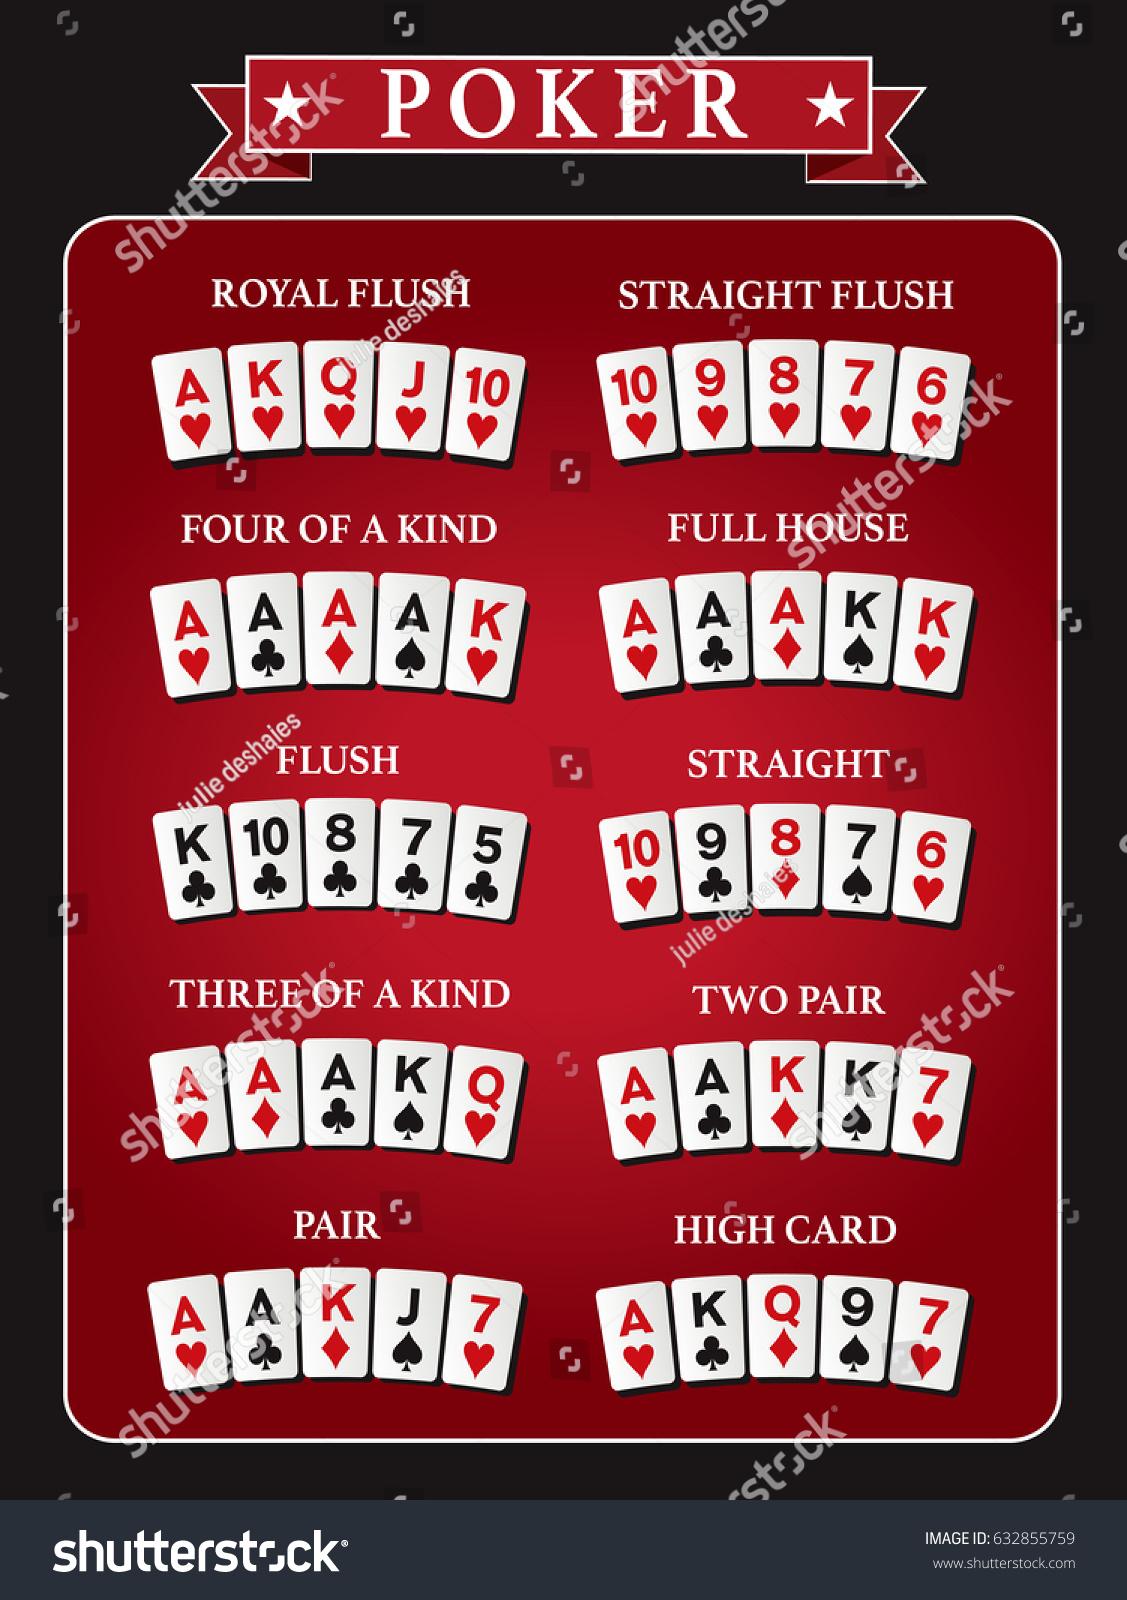 Ignition poker mobile